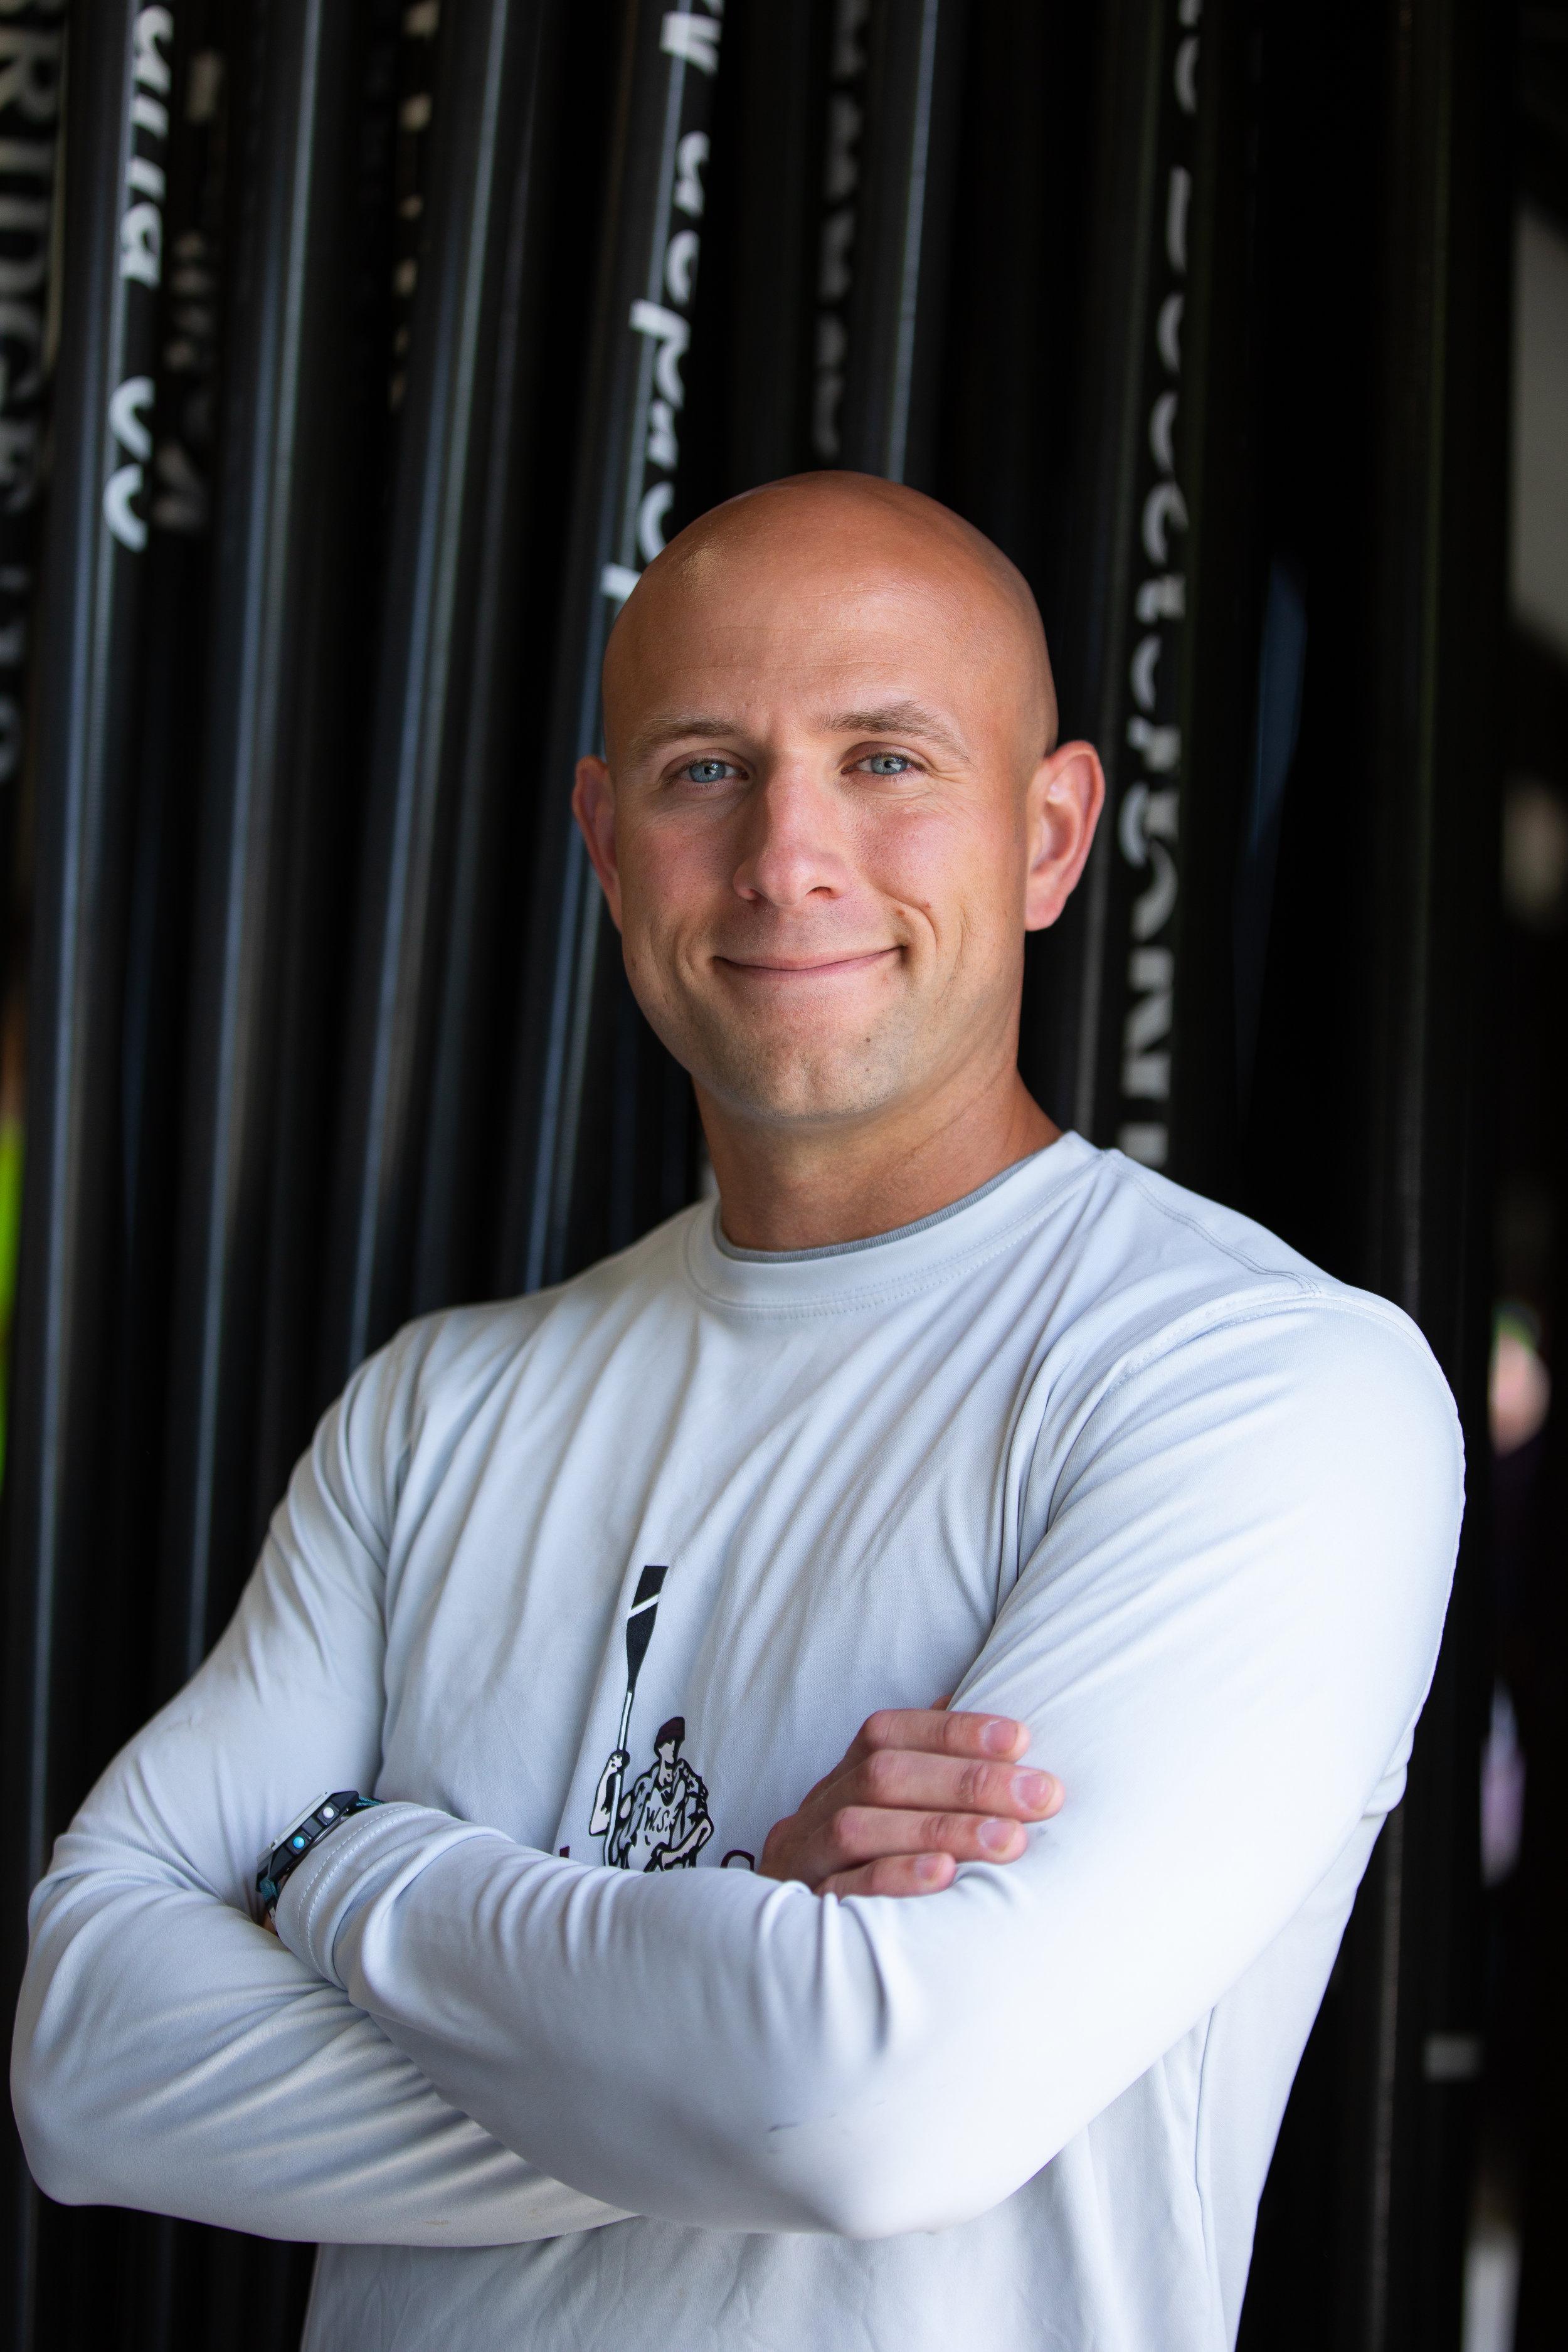 Miles Schwartz-Director of Operations, Regatta Director, and Boatman - mschwartz@wsrc.org